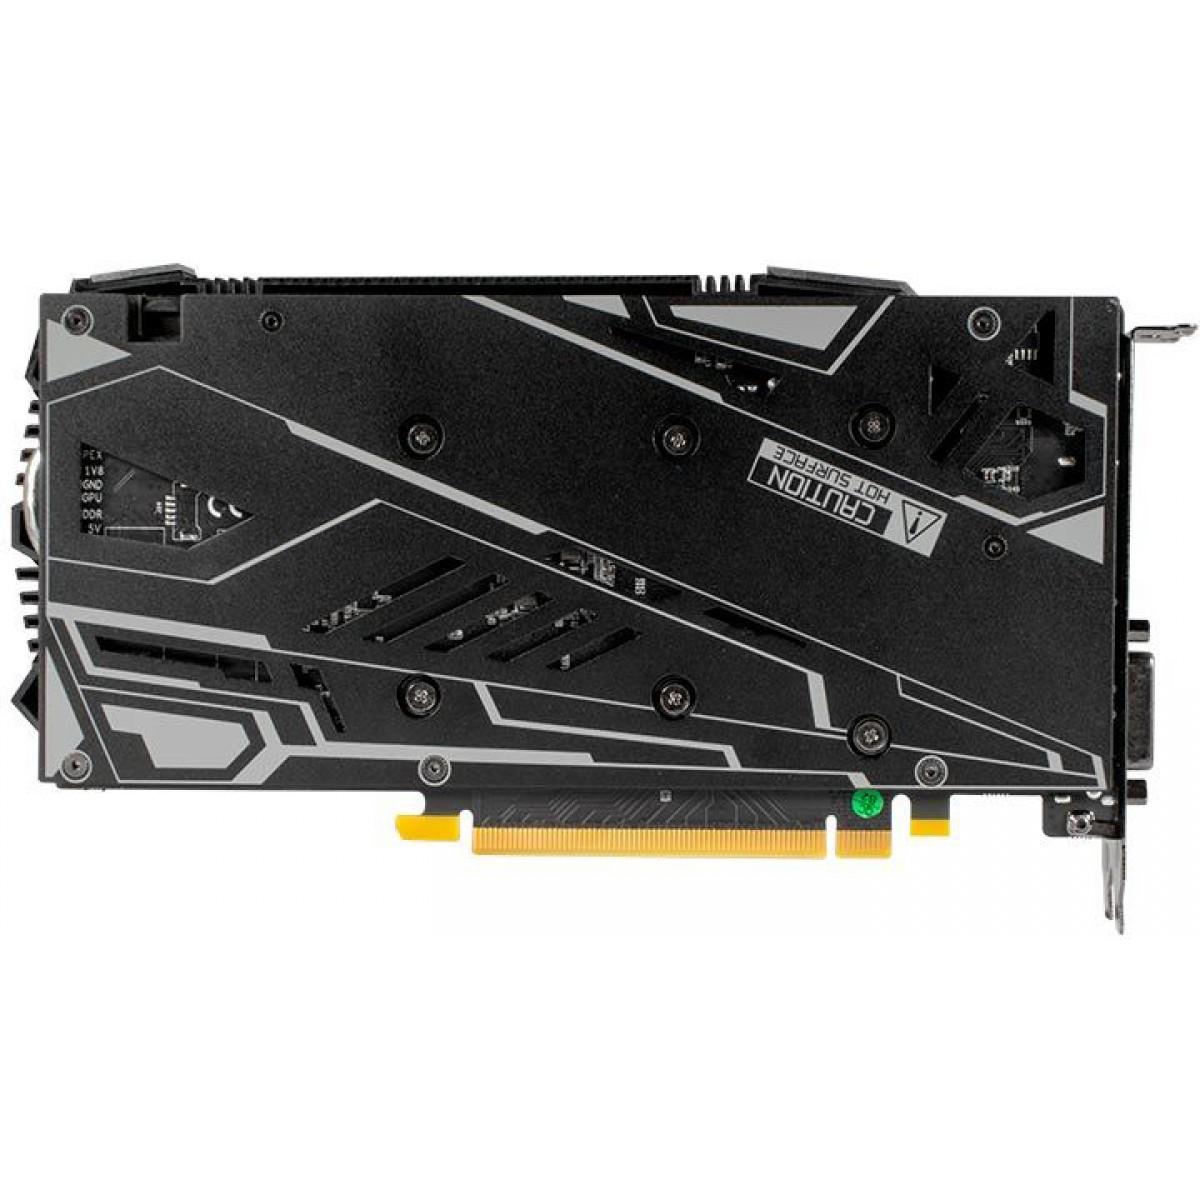 Placa de Vídeo Galax GeForce RTX 2060 (1-Click OC), 6GB GDDR6, 192Bit, 26NRL7HP68CX